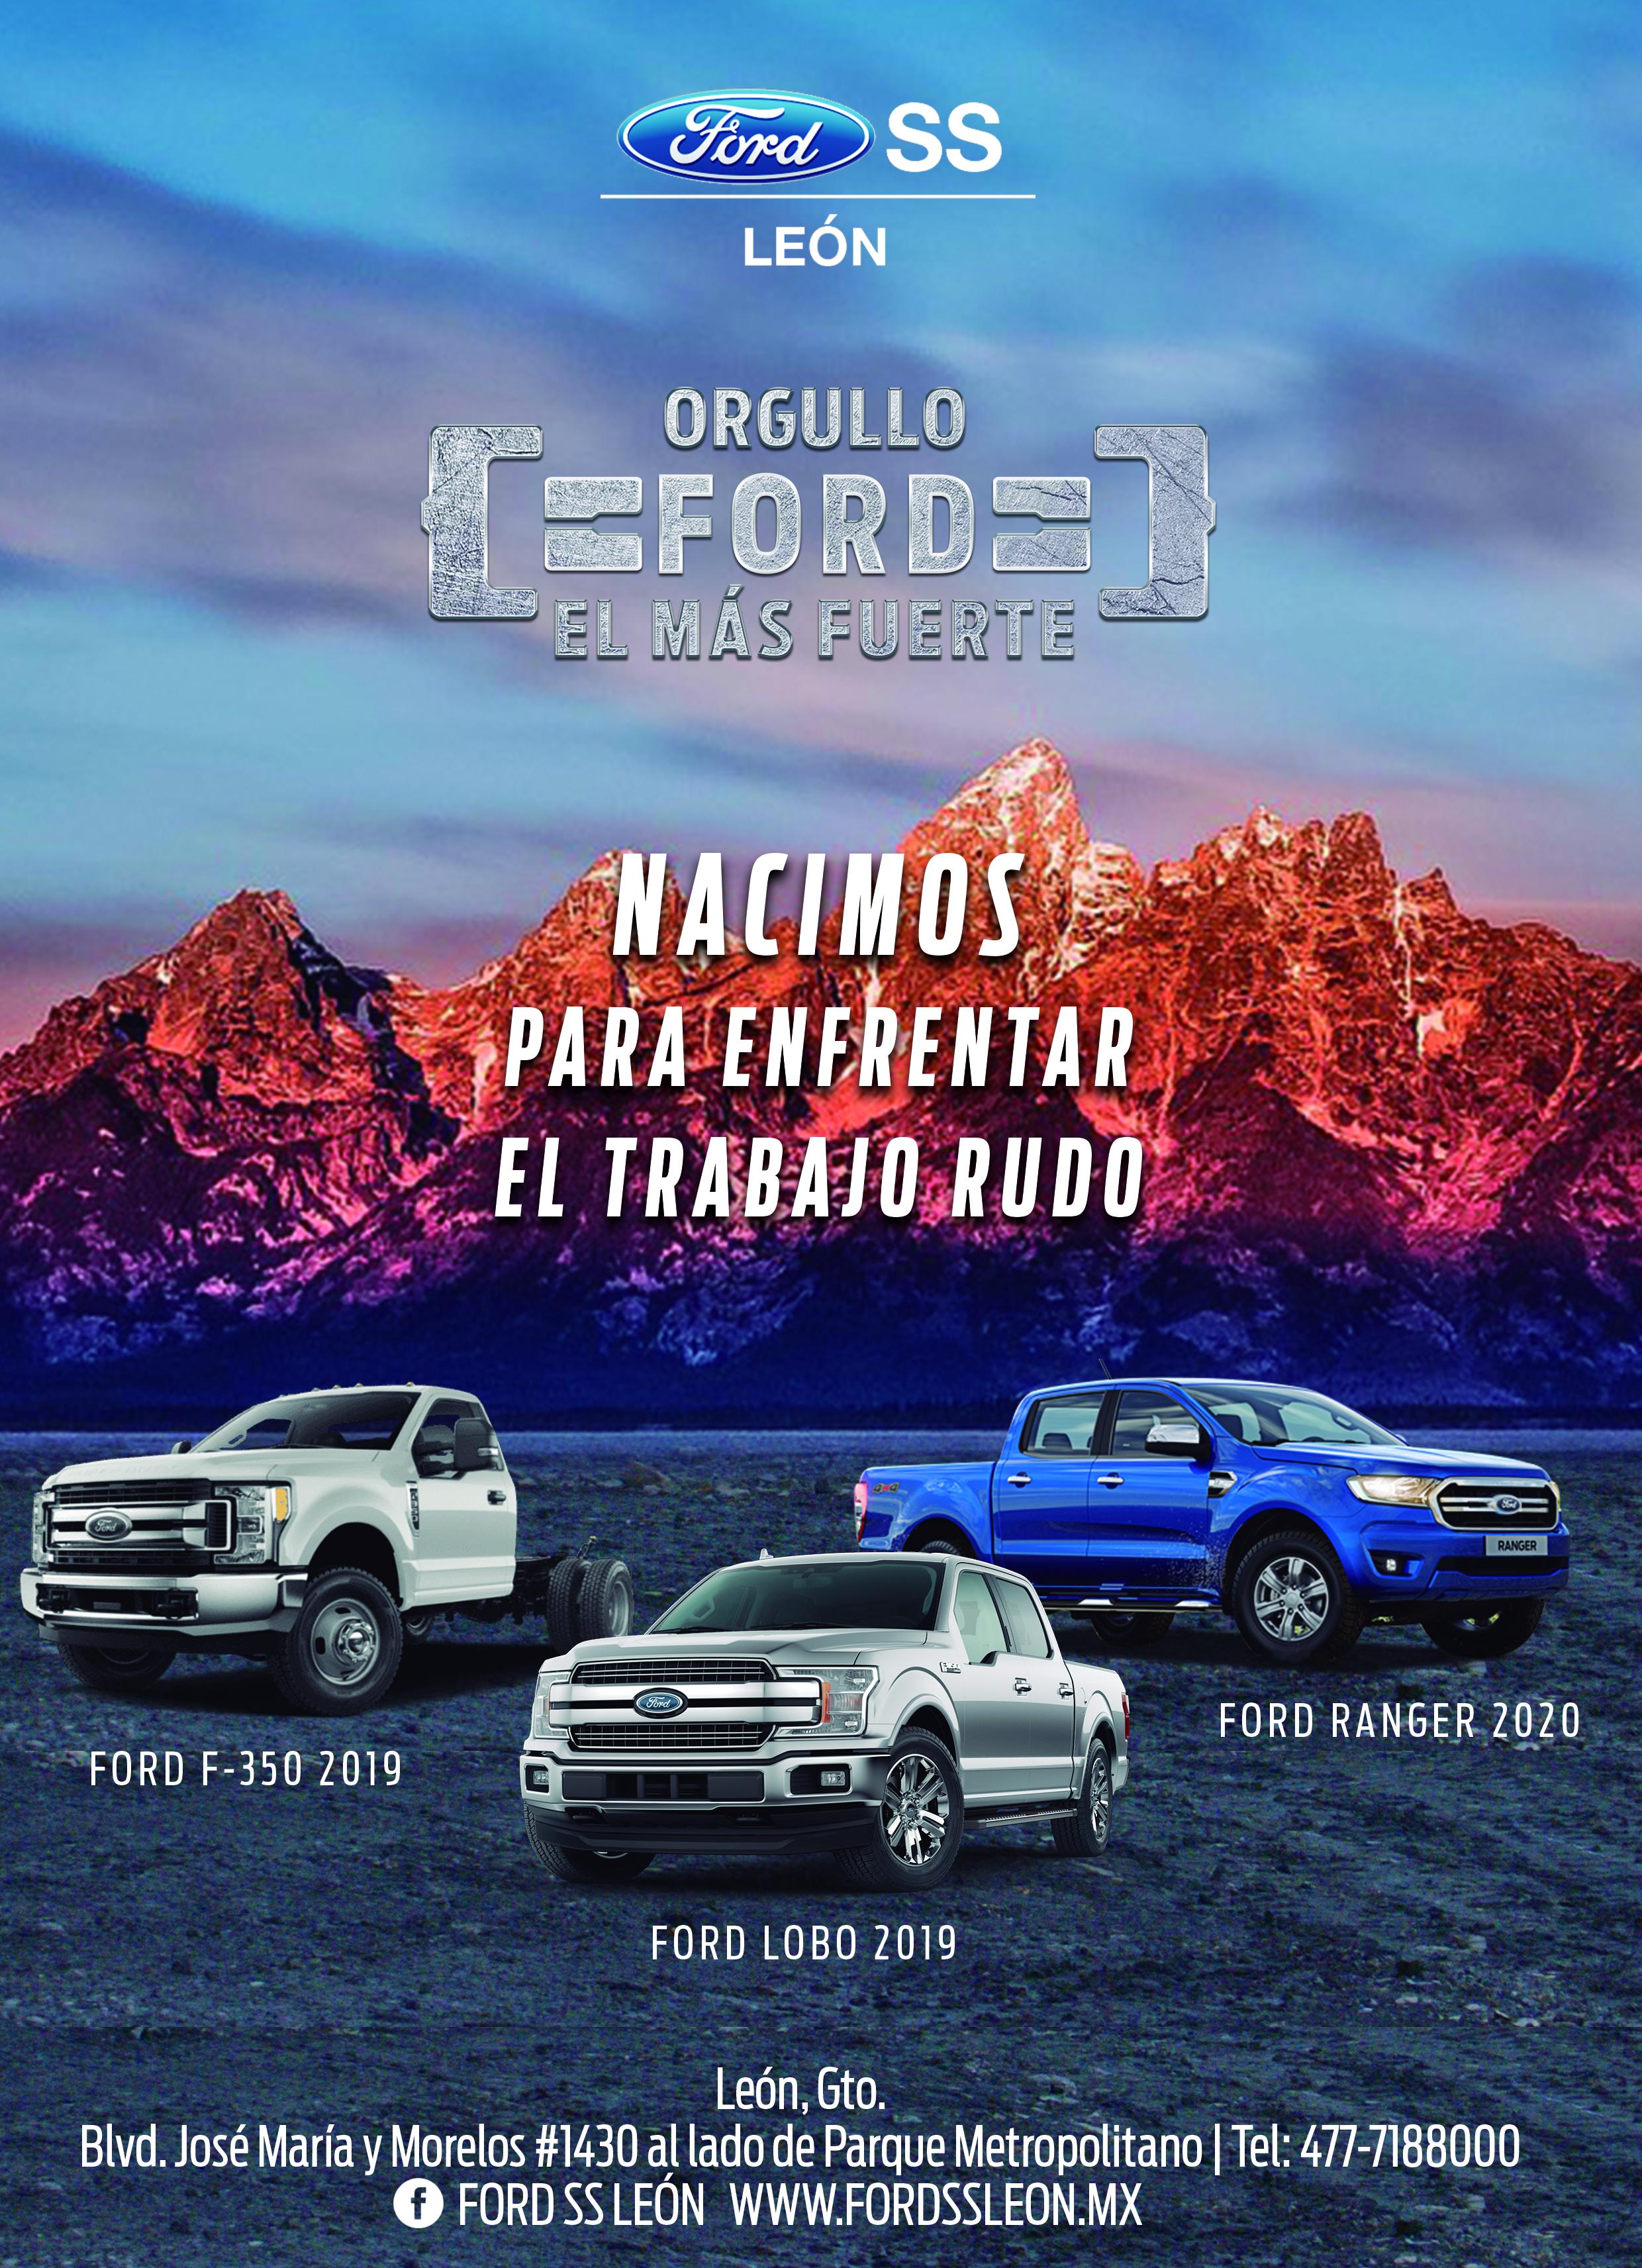 Ford Revista tamaño completa 21x 29